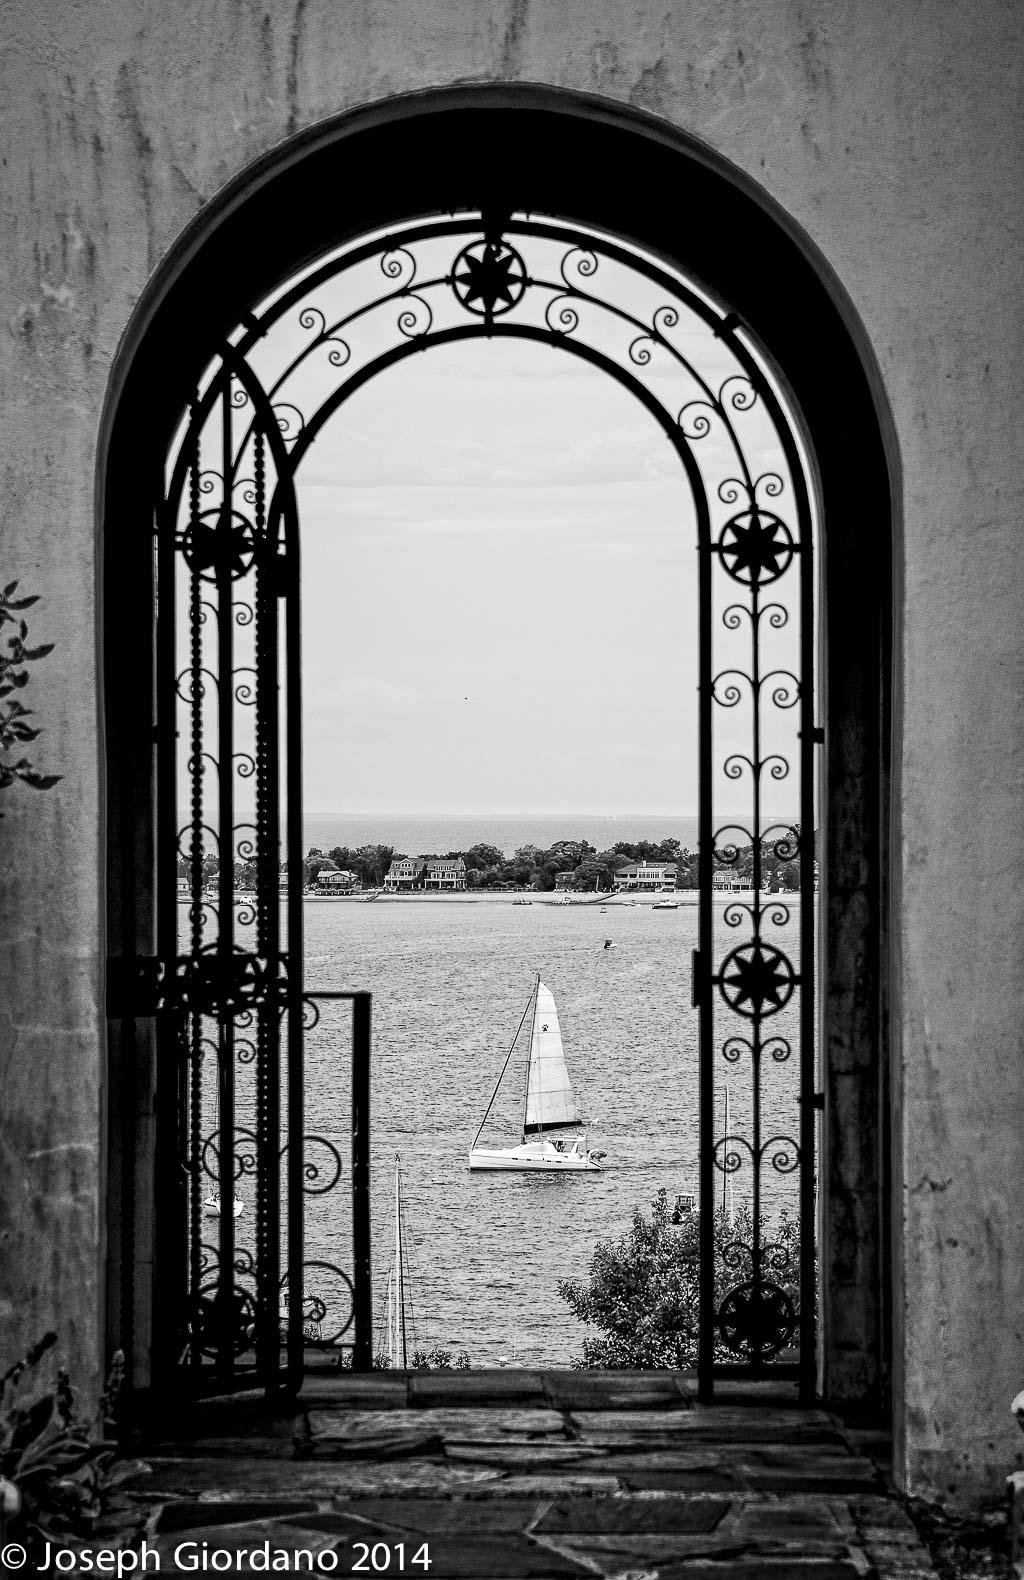 Sailing (1 of 1)